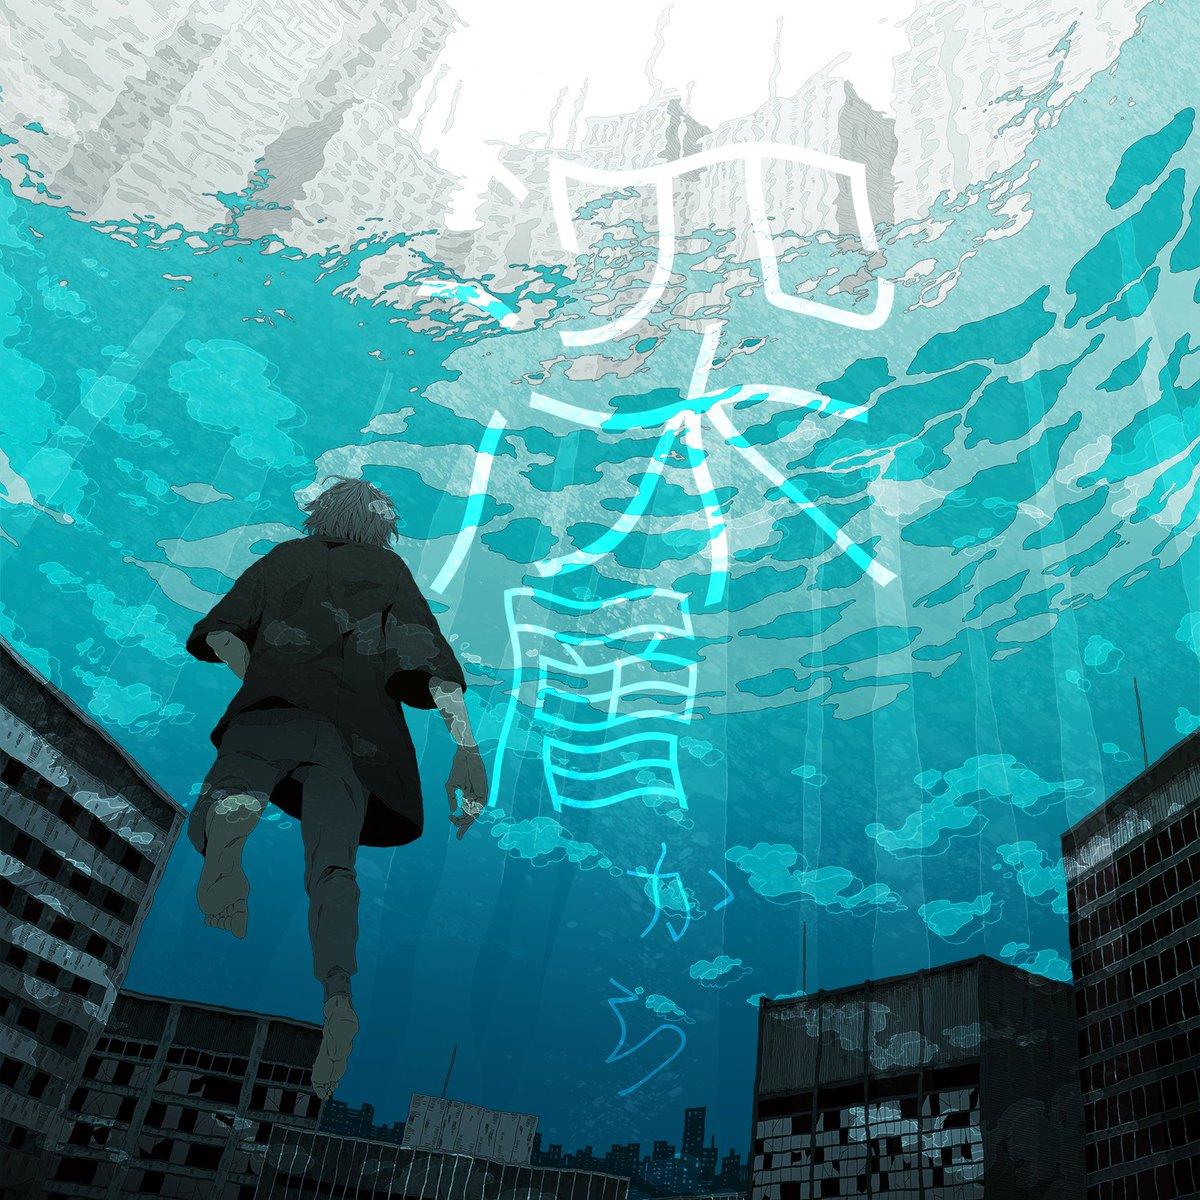 『Sou - シンソウ』収録の『深層から』ジャケット